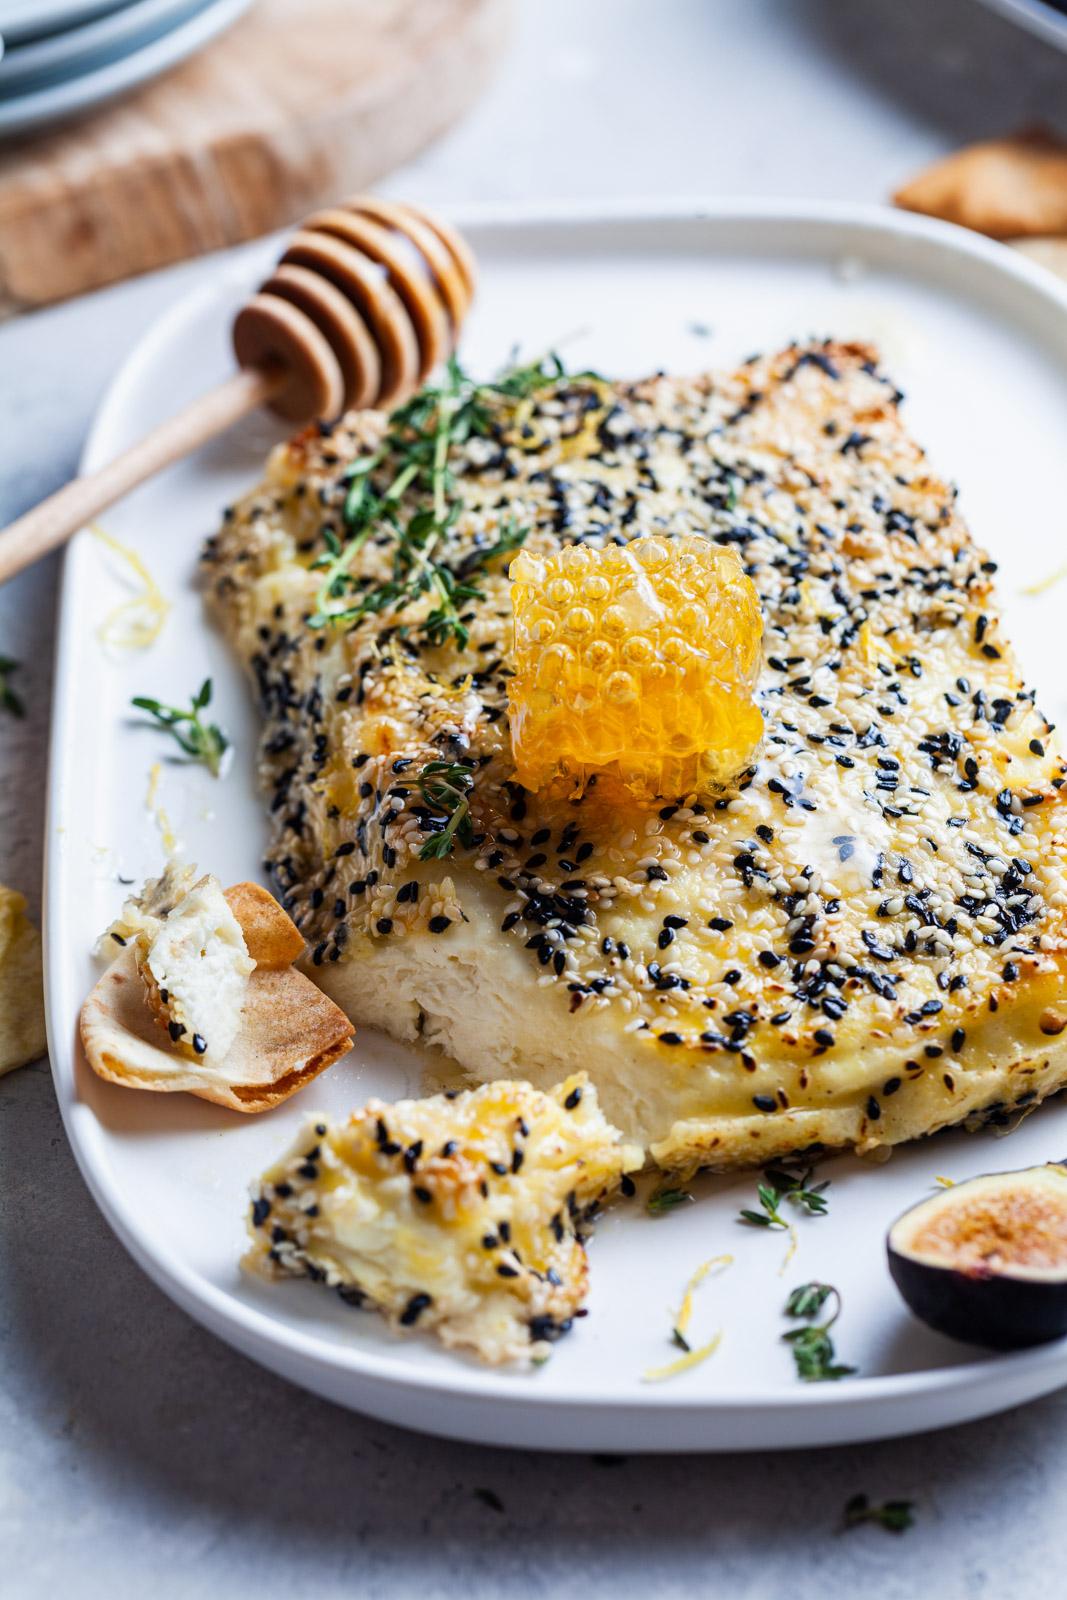 Baked Sesame Crusted Feta